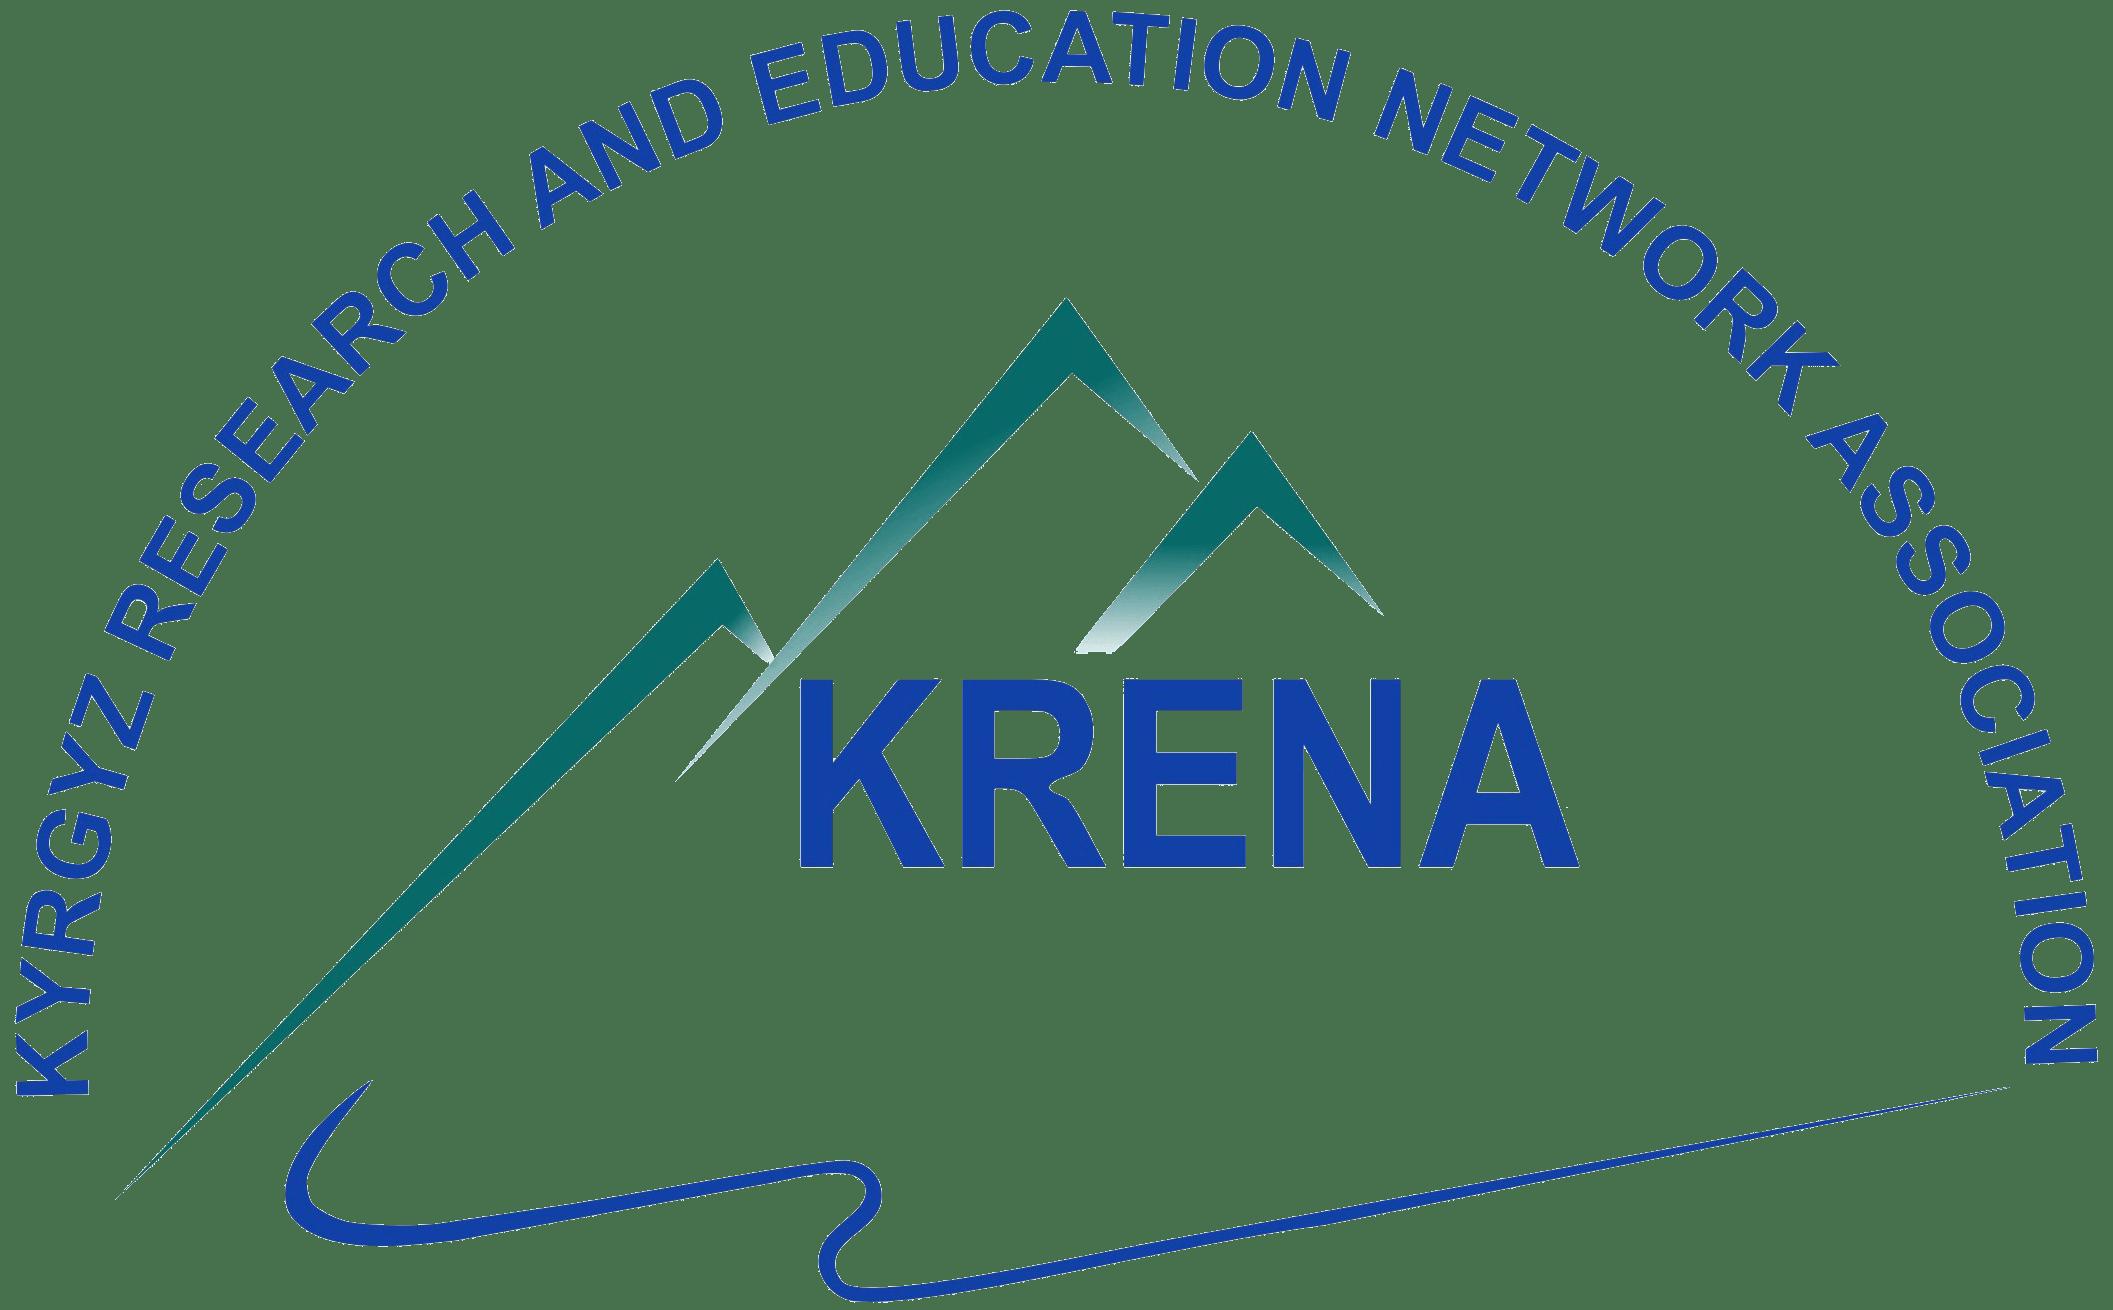 KRENA (Kyrgyzstan)